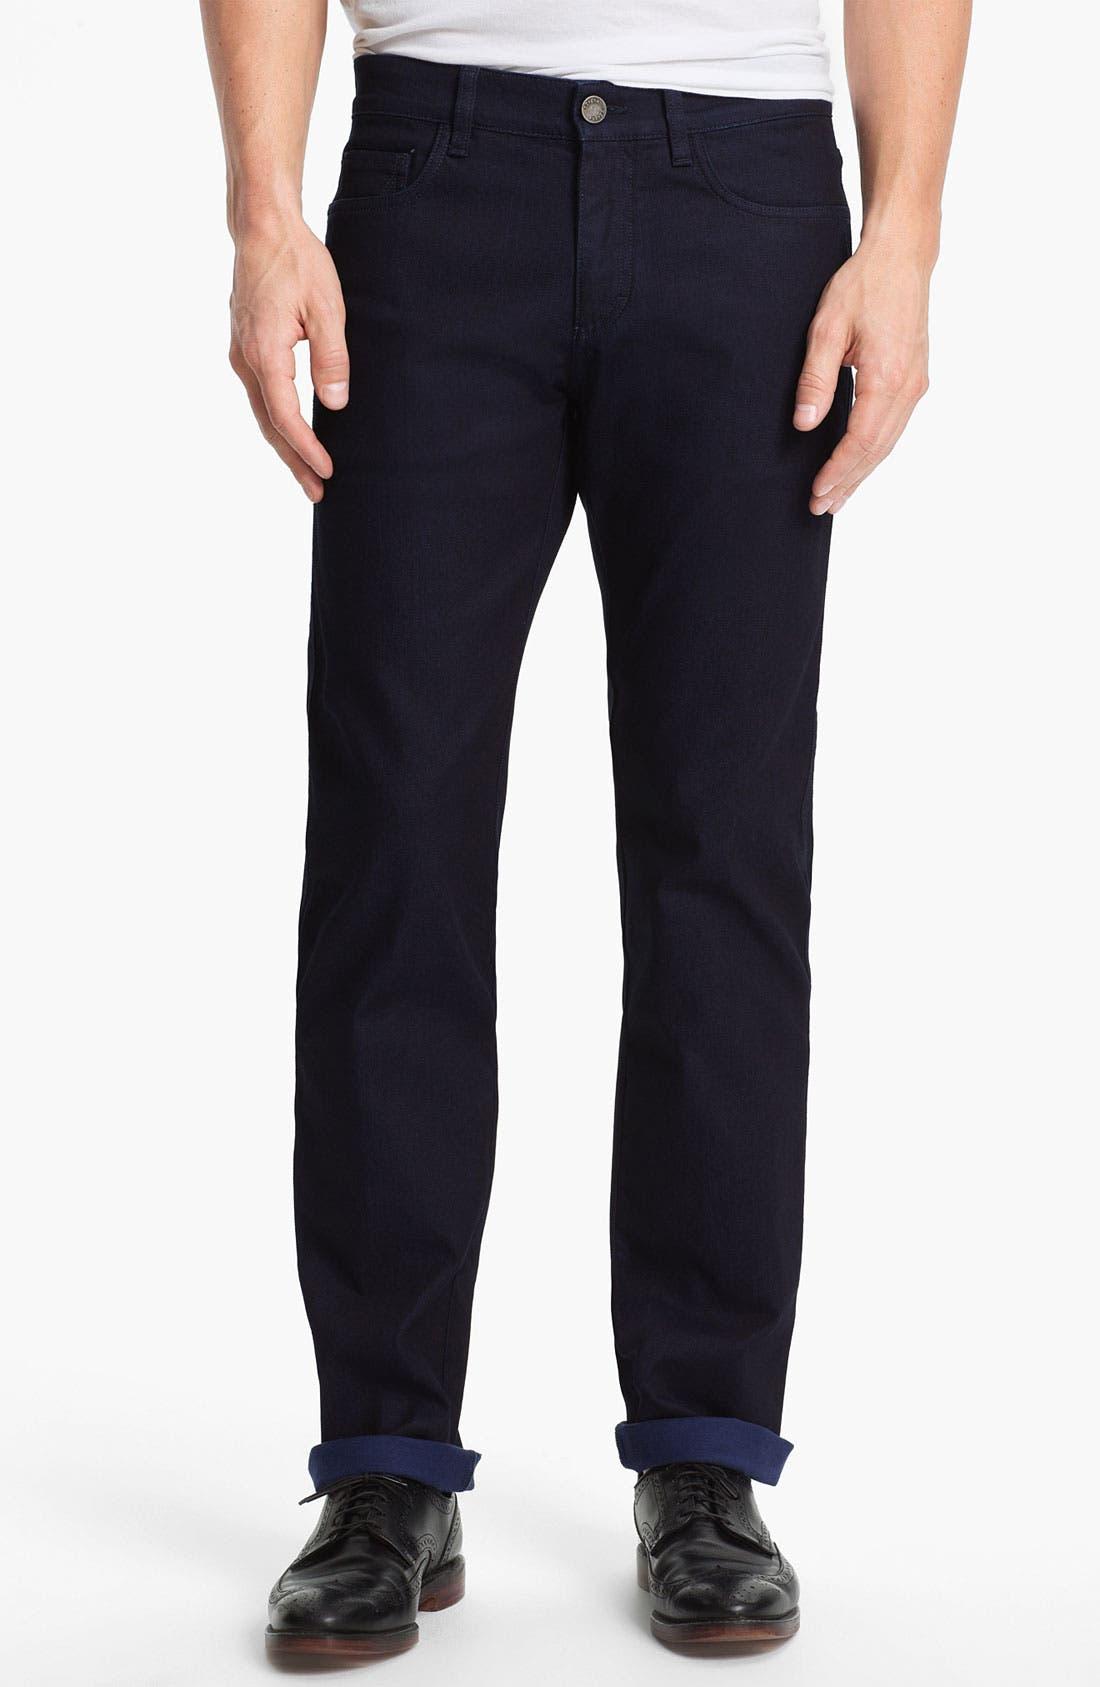 Alternate Image 1 Selected - Z Zegna Straight Leg Jeans (Navy)